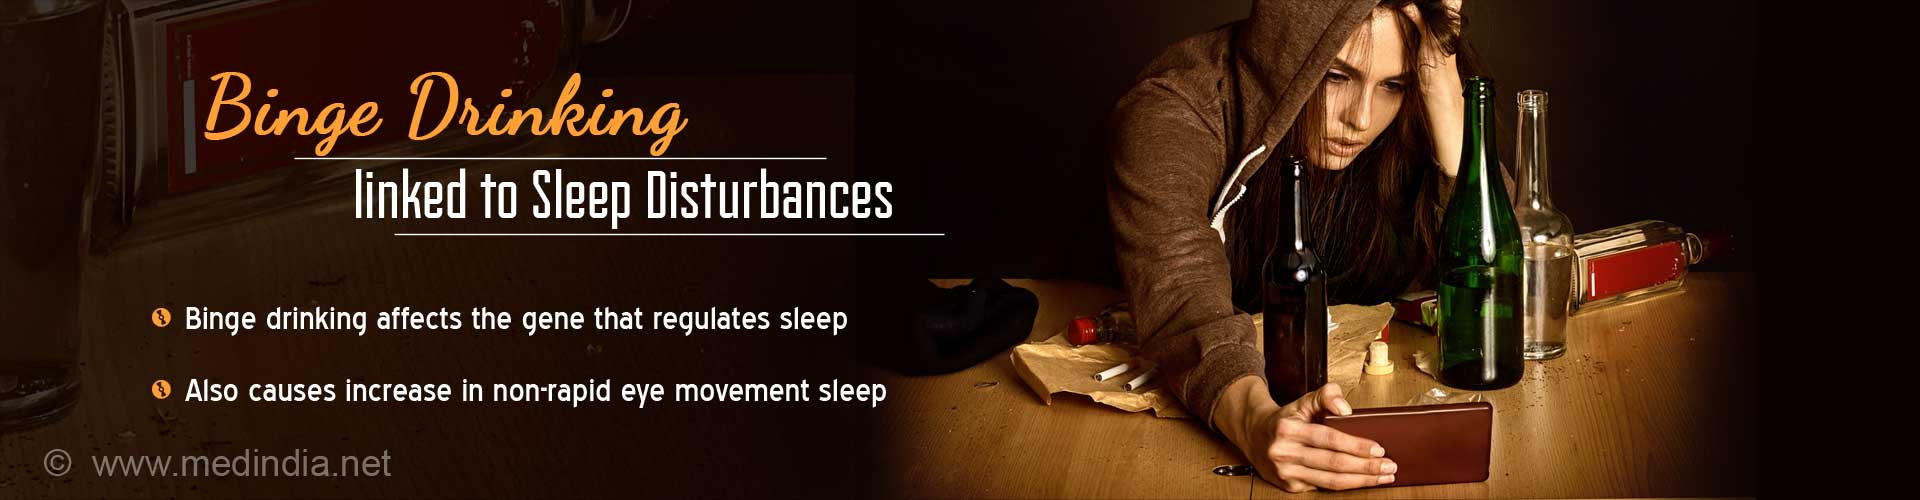 Binge Drinking may Cause Sleep Disturbances